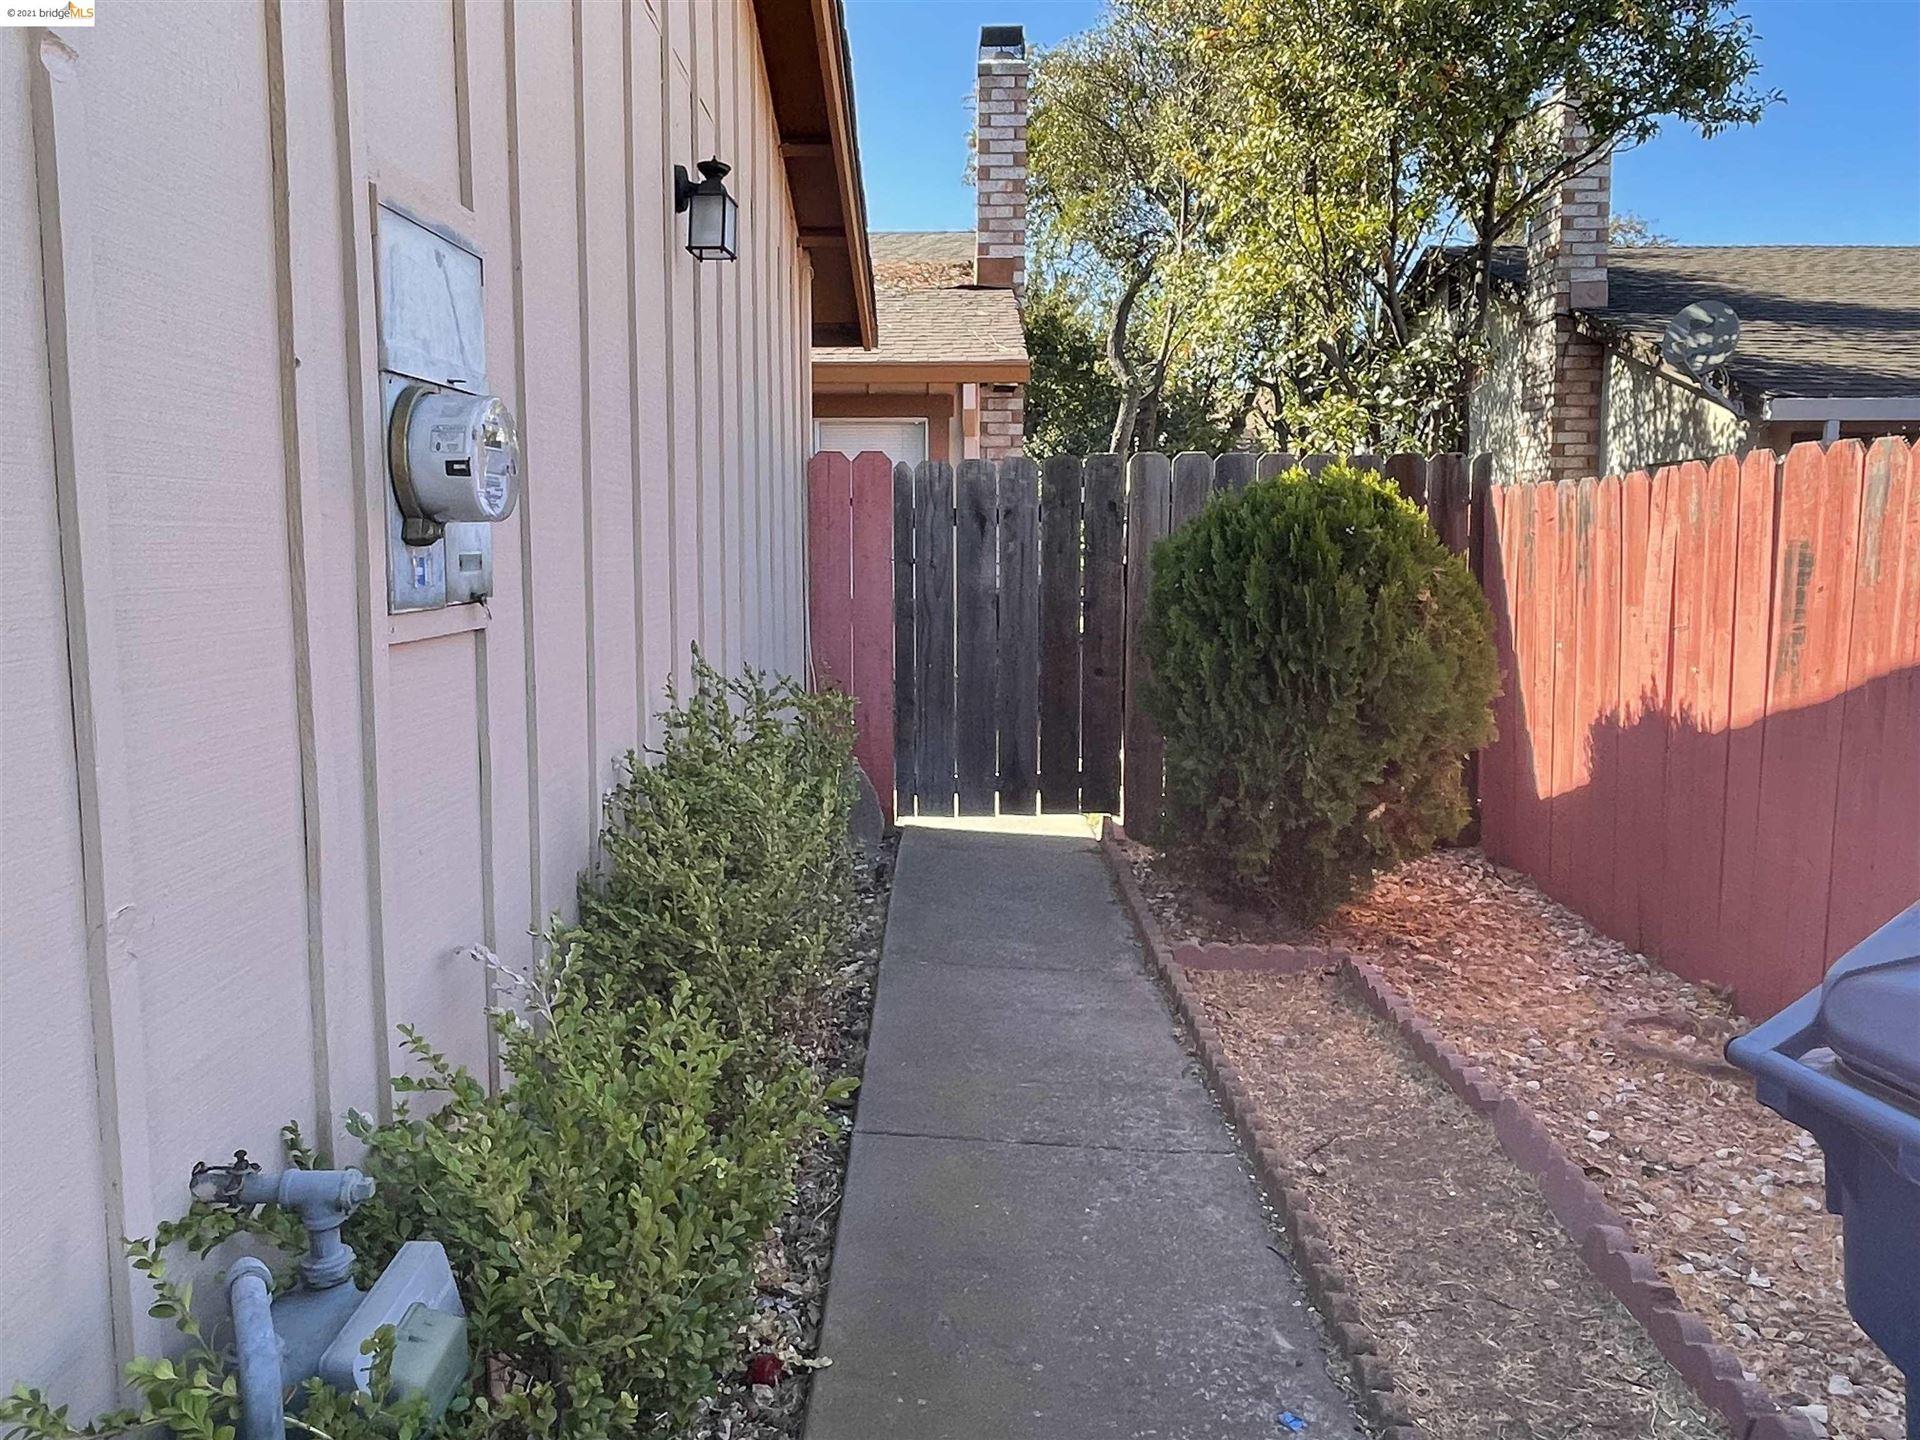 Photo of 2112 Banyan Way, Antioch, CA 94509 (MLS # 40971224)